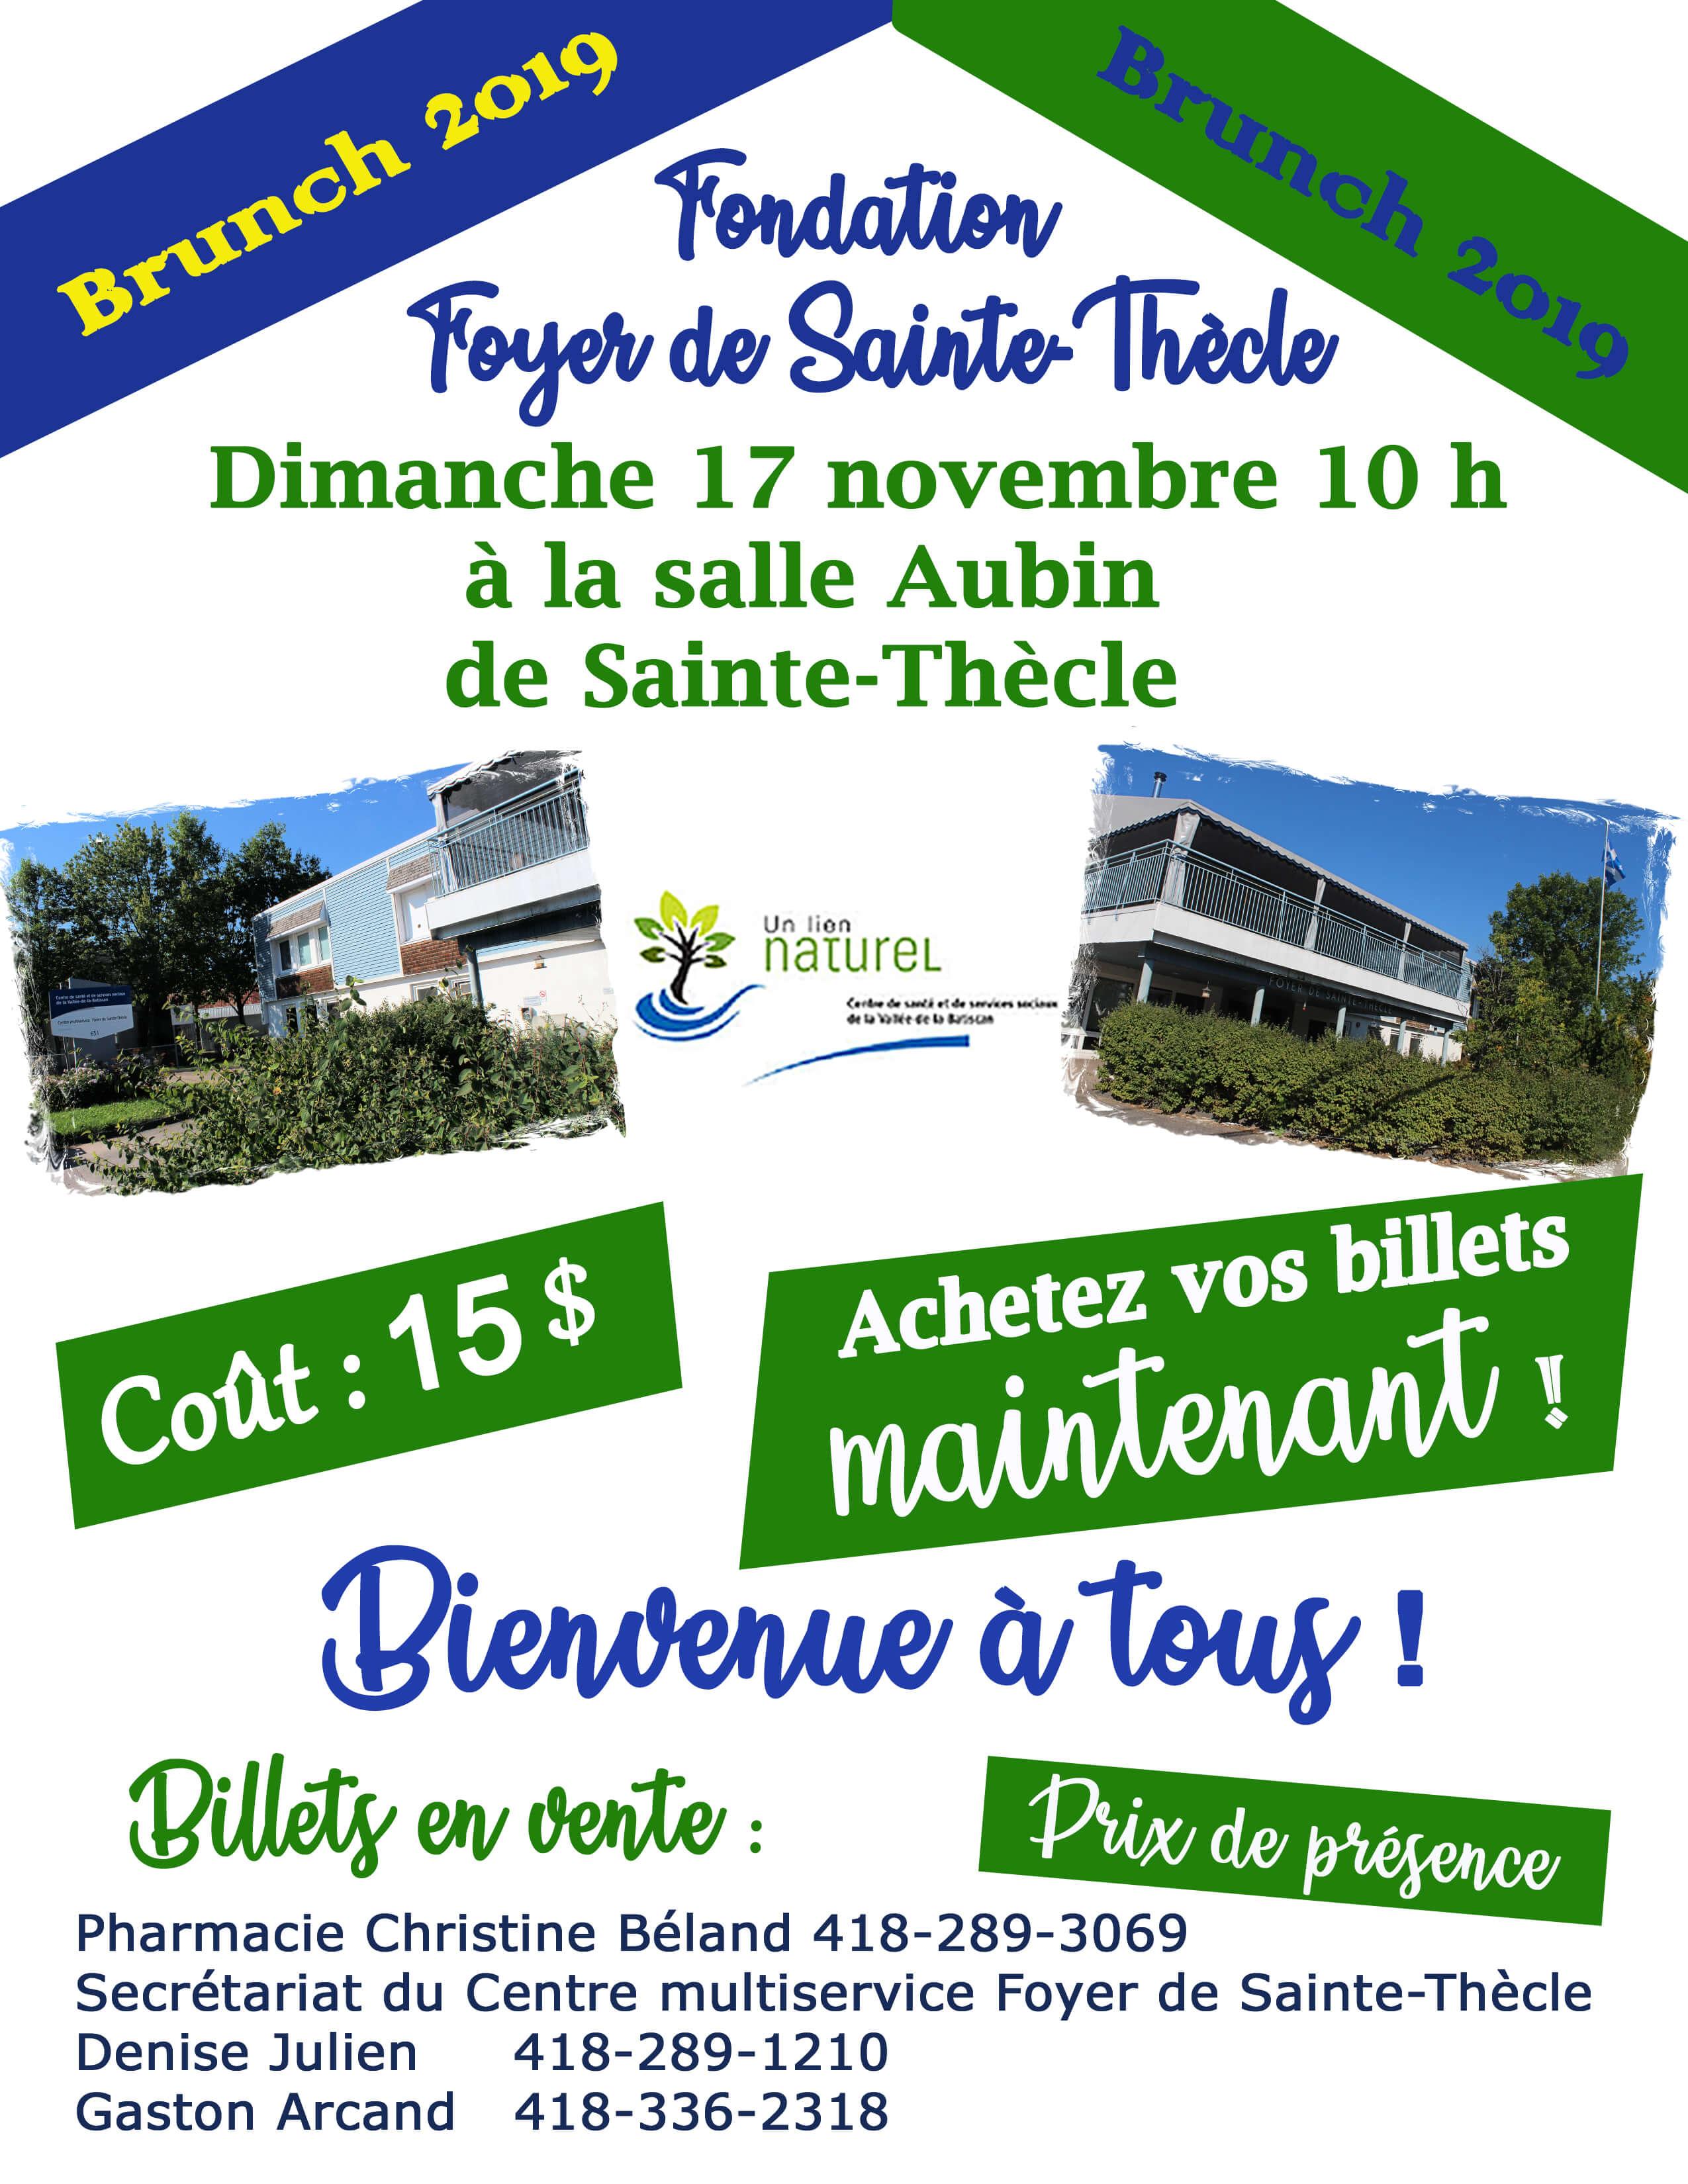 Brunch Fondation Foyer Sainte-Thècle